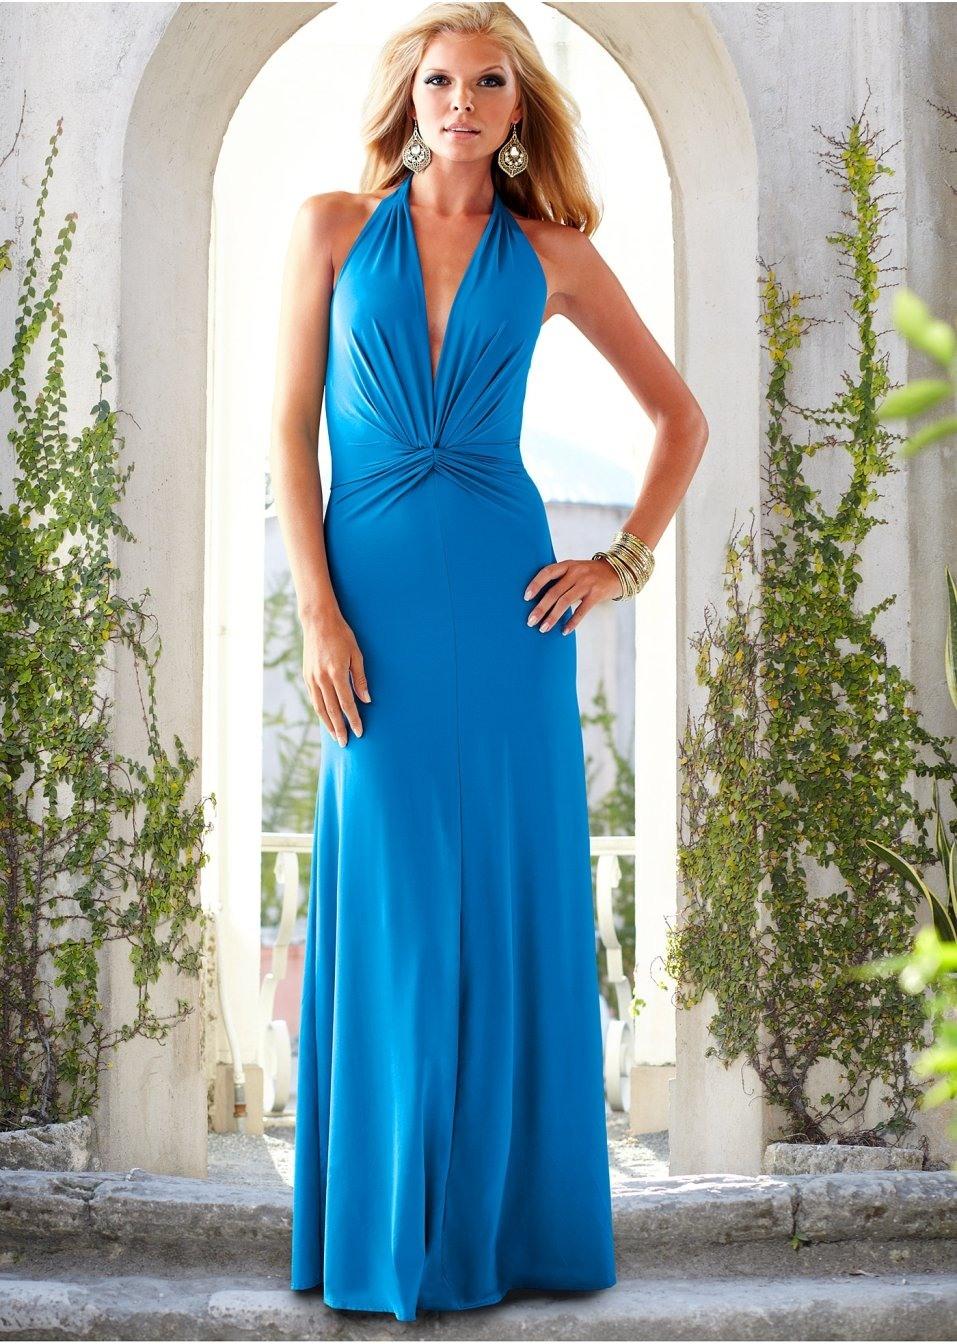 17 Großartig Preiswerte Abendkleider Lang Vertrieb15 Wunderbar Preiswerte Abendkleider Lang Vertrieb